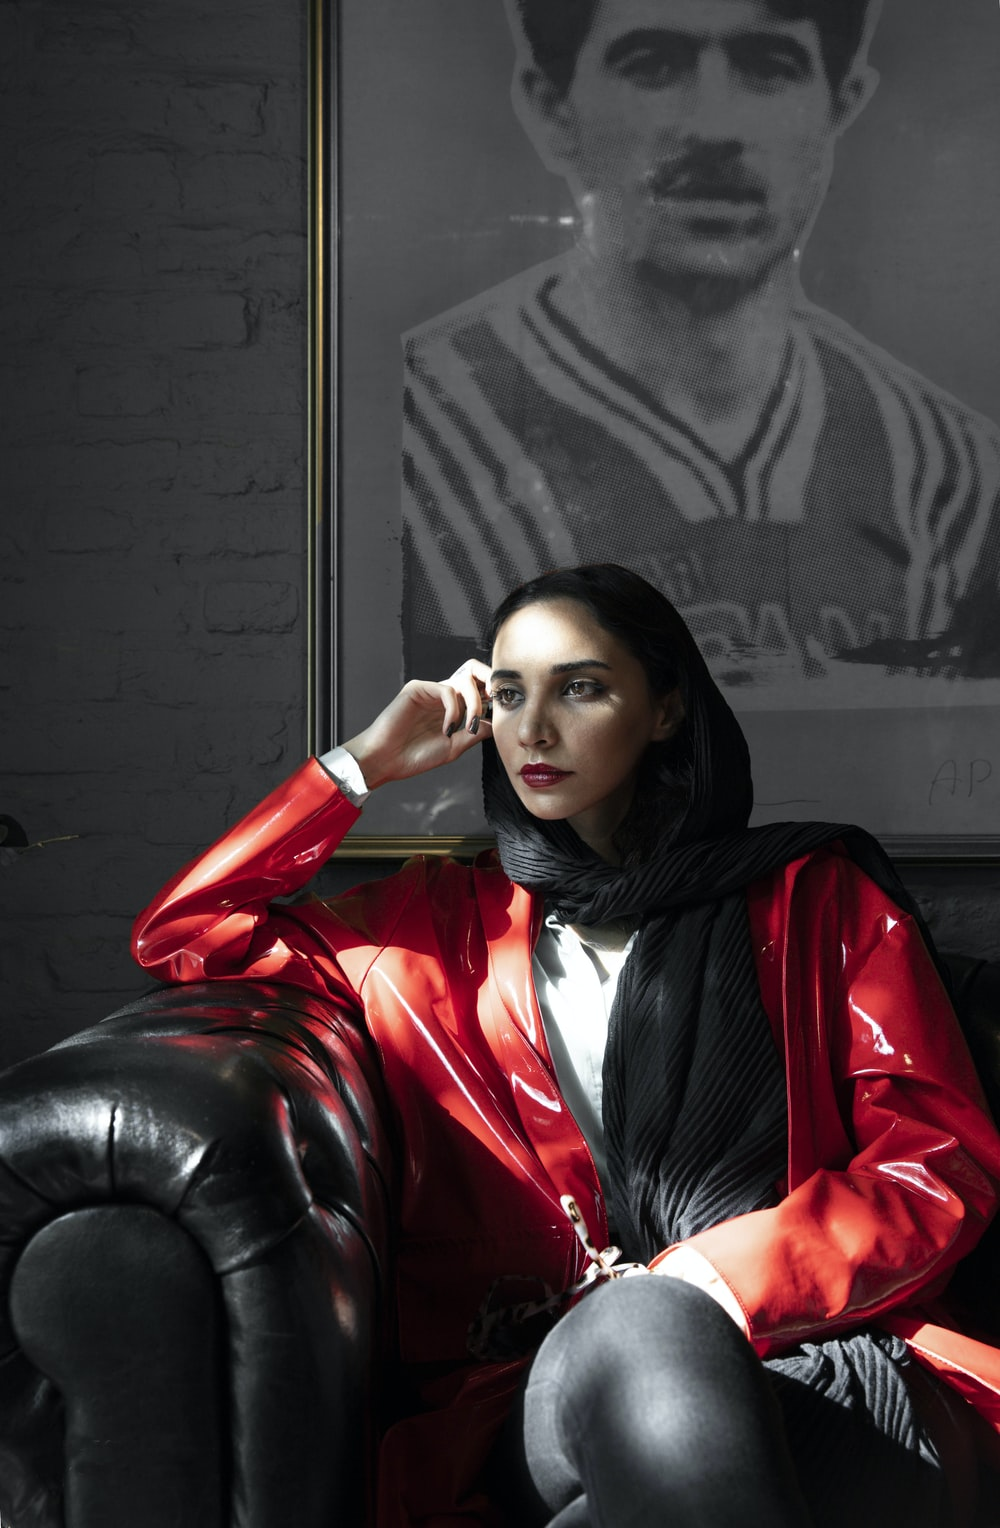 woman sitting on black sofa behind portriat on wall